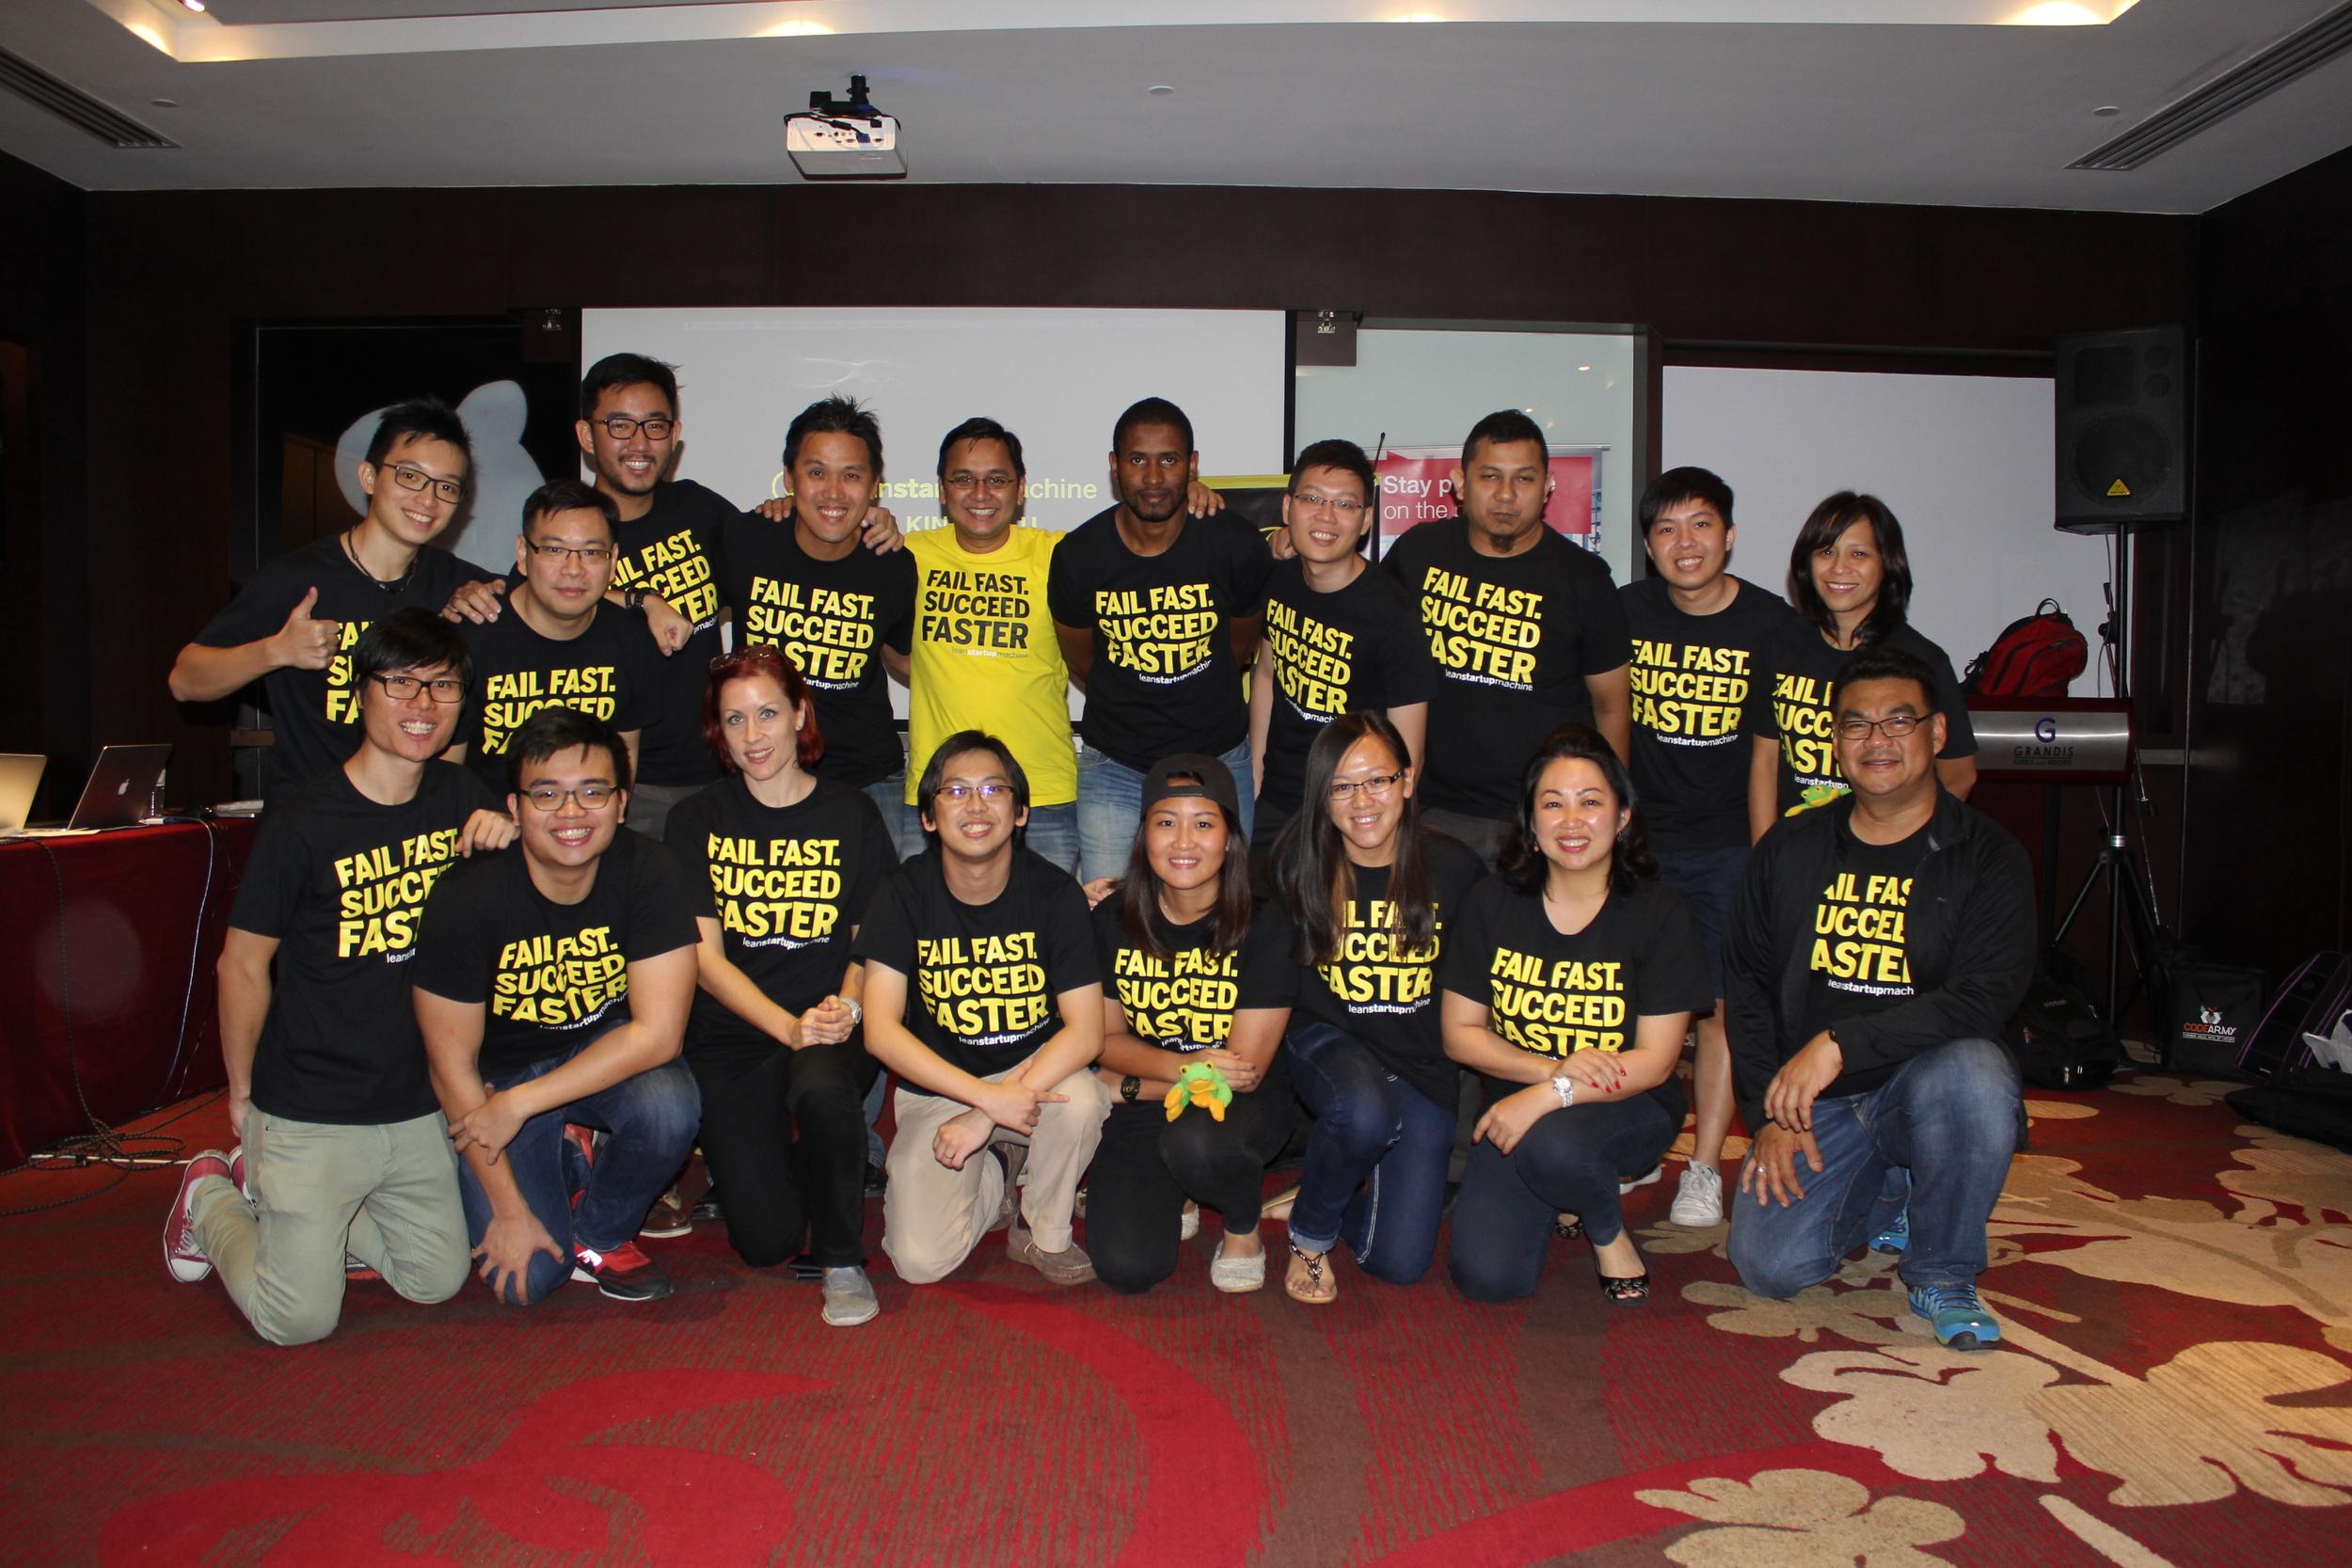 LSM KK Organizers, Mentors and Volunteers